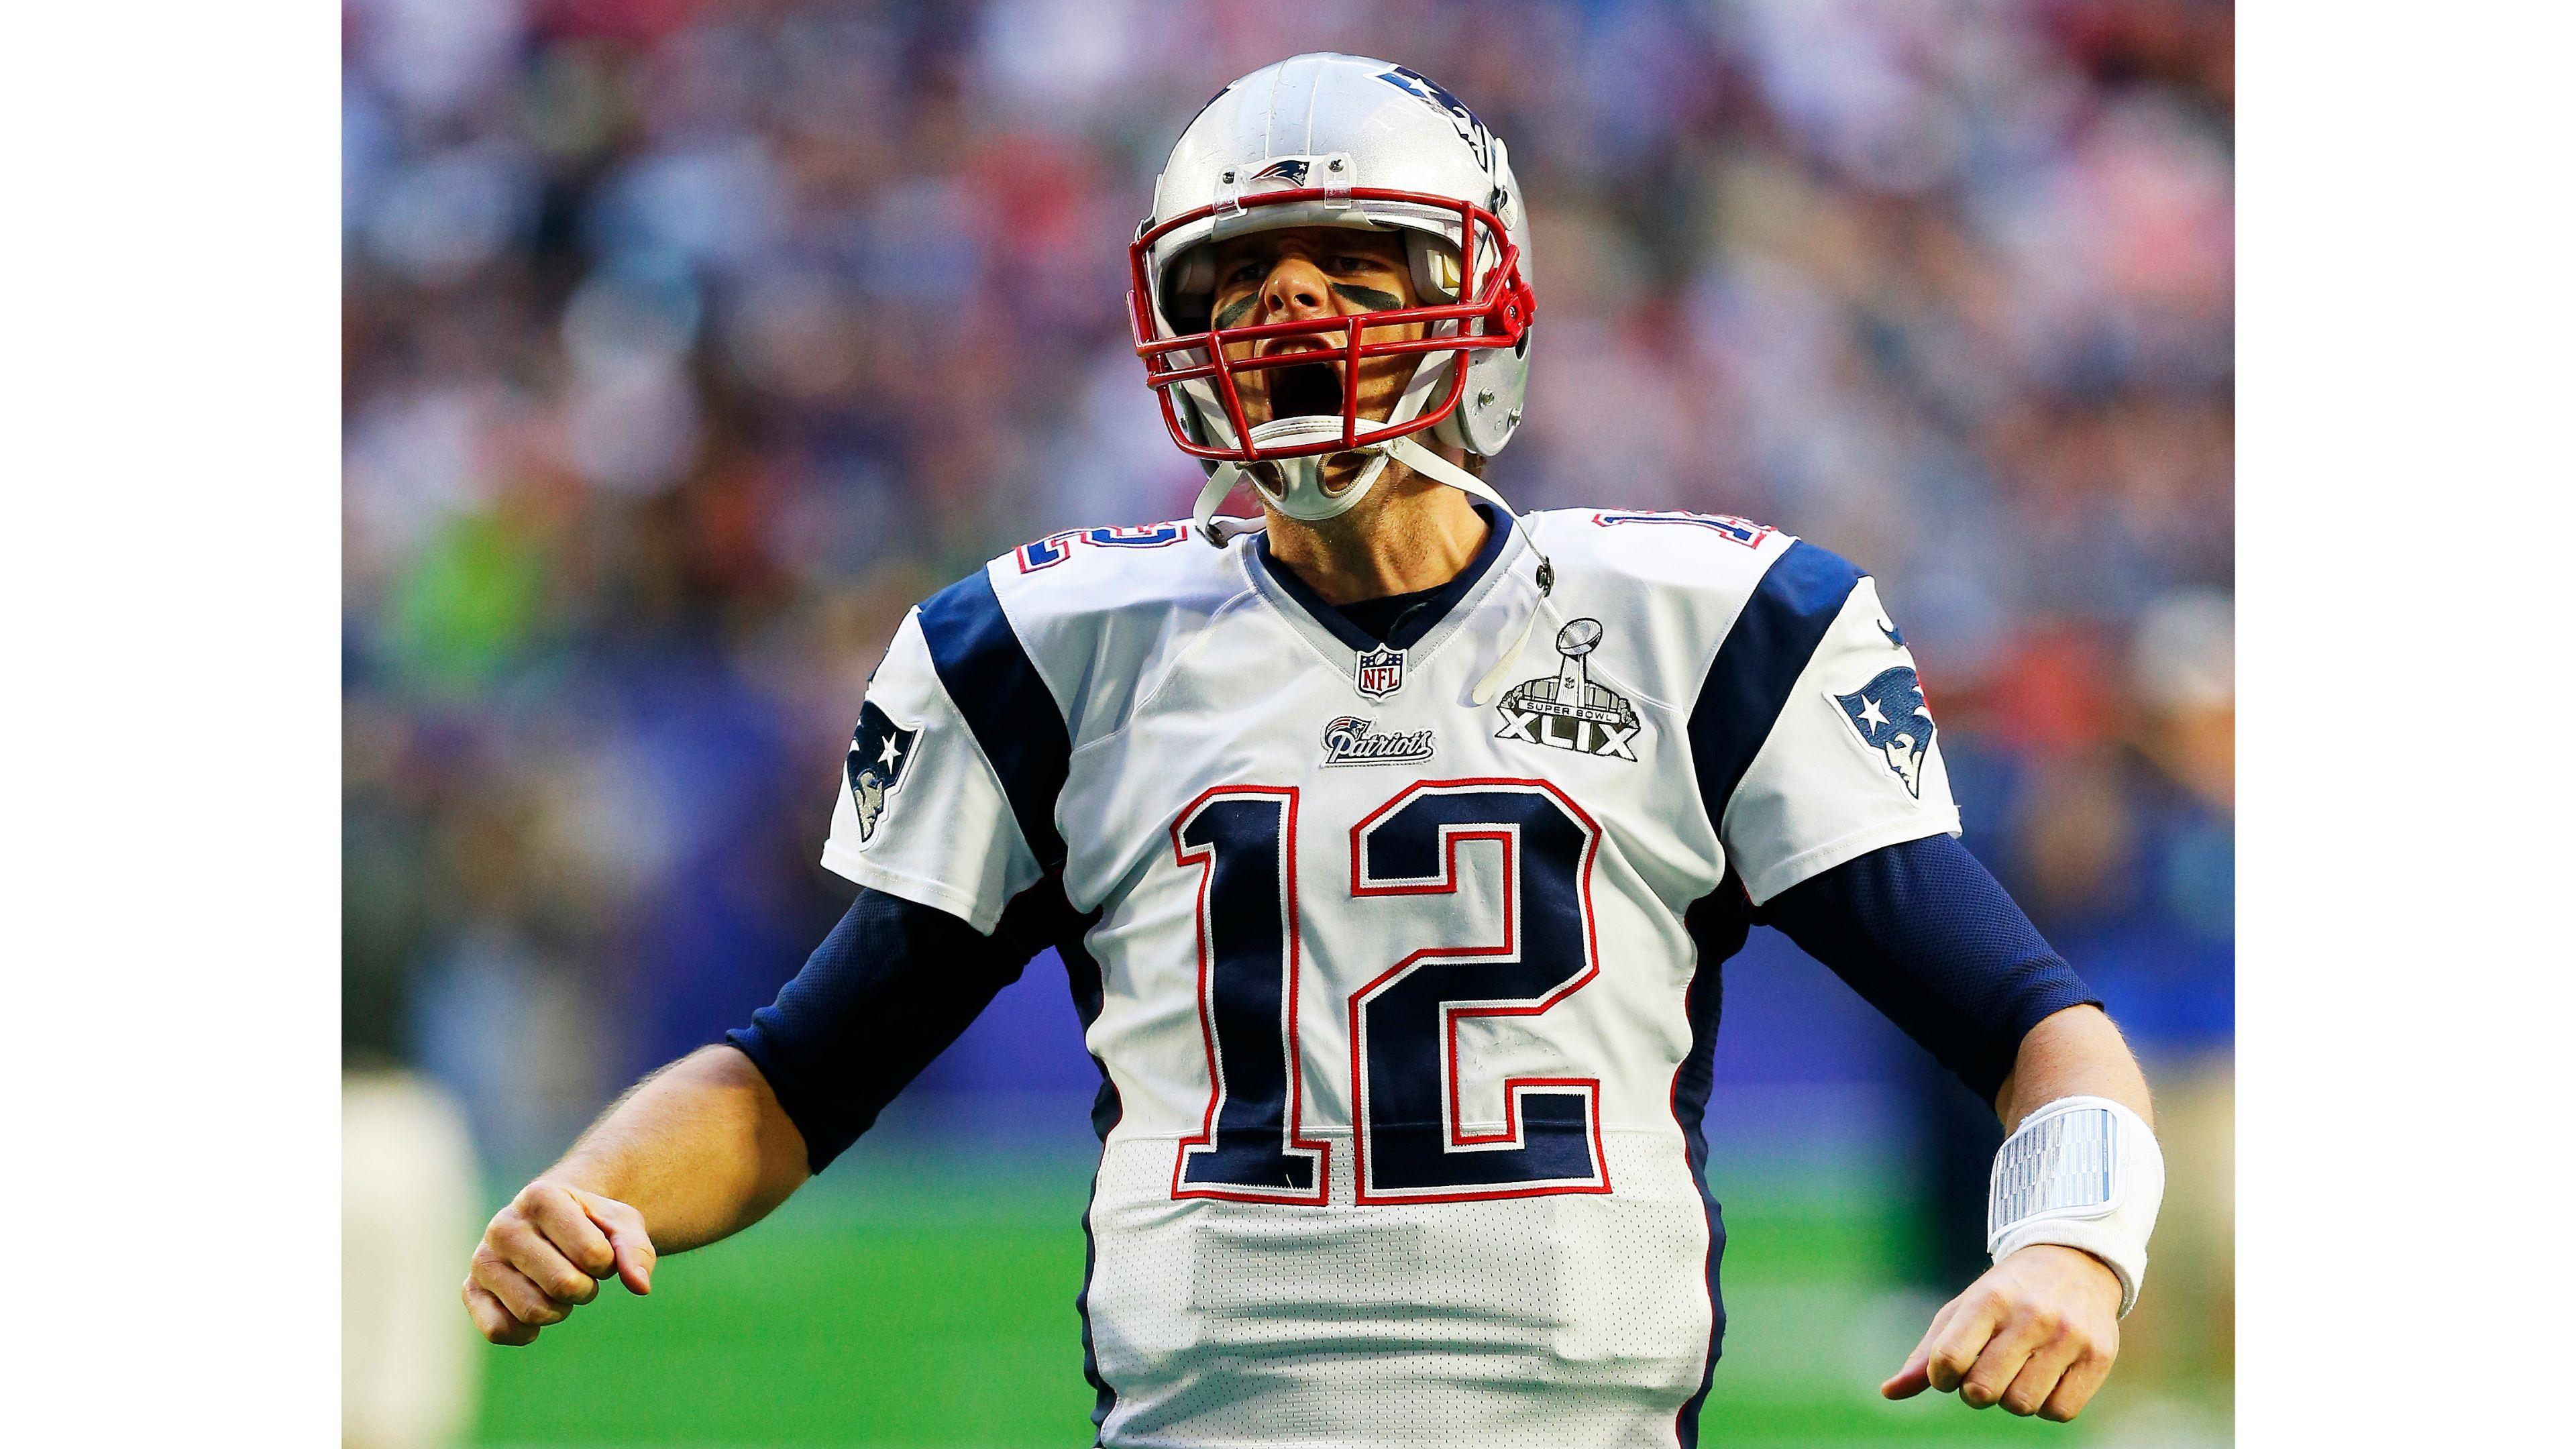 Sport Wallpaper Tom Brady: Tom Brady 2018 Wallpapers